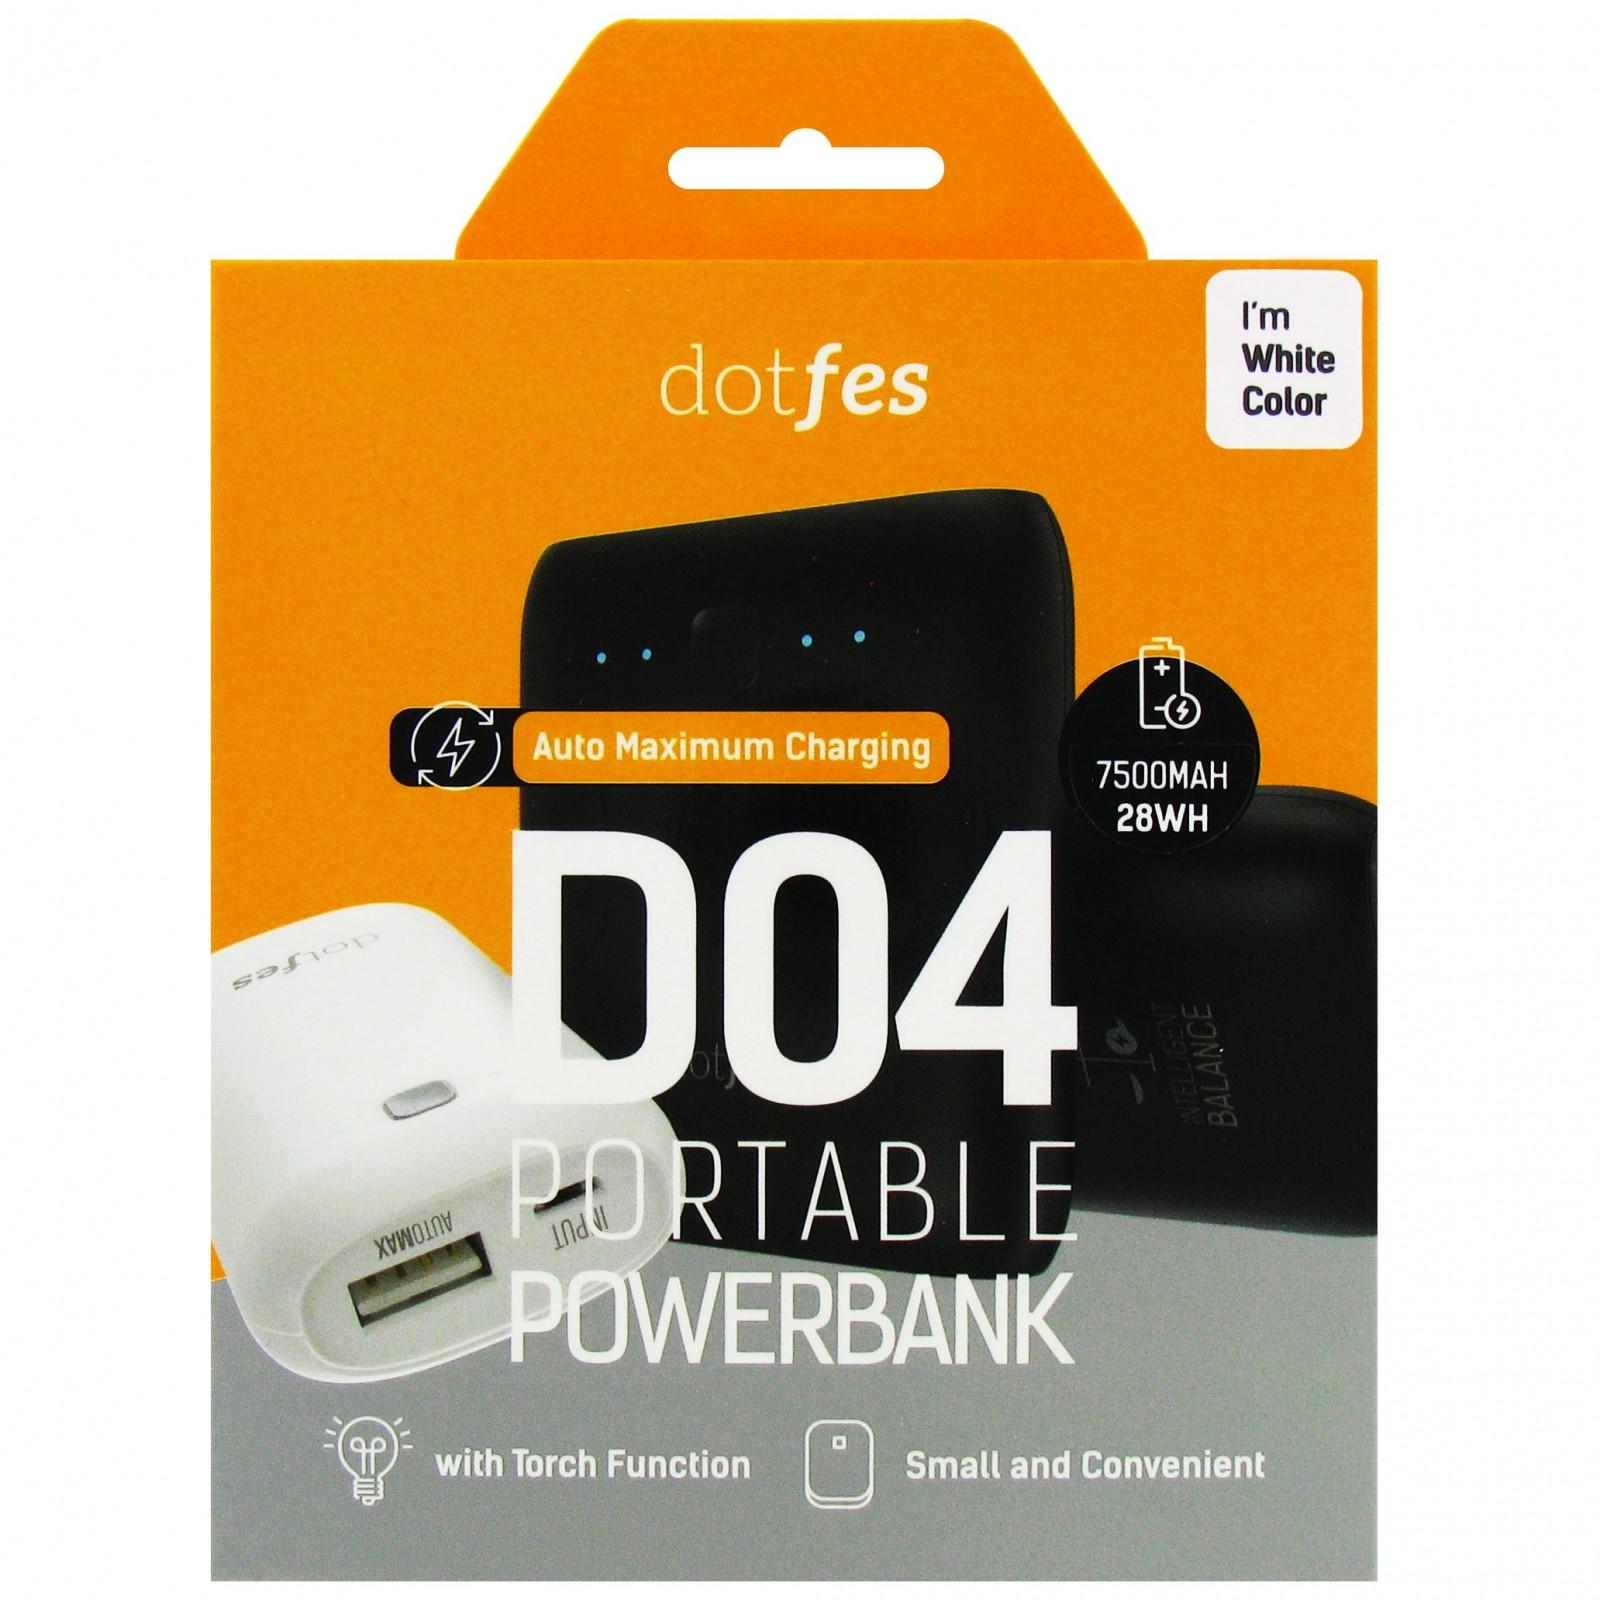 Аккумулятор внешний резервный Dotfes D04-7 7500mAh AutoMax, два USB выхода 1А / 2,1A + фонарик, white